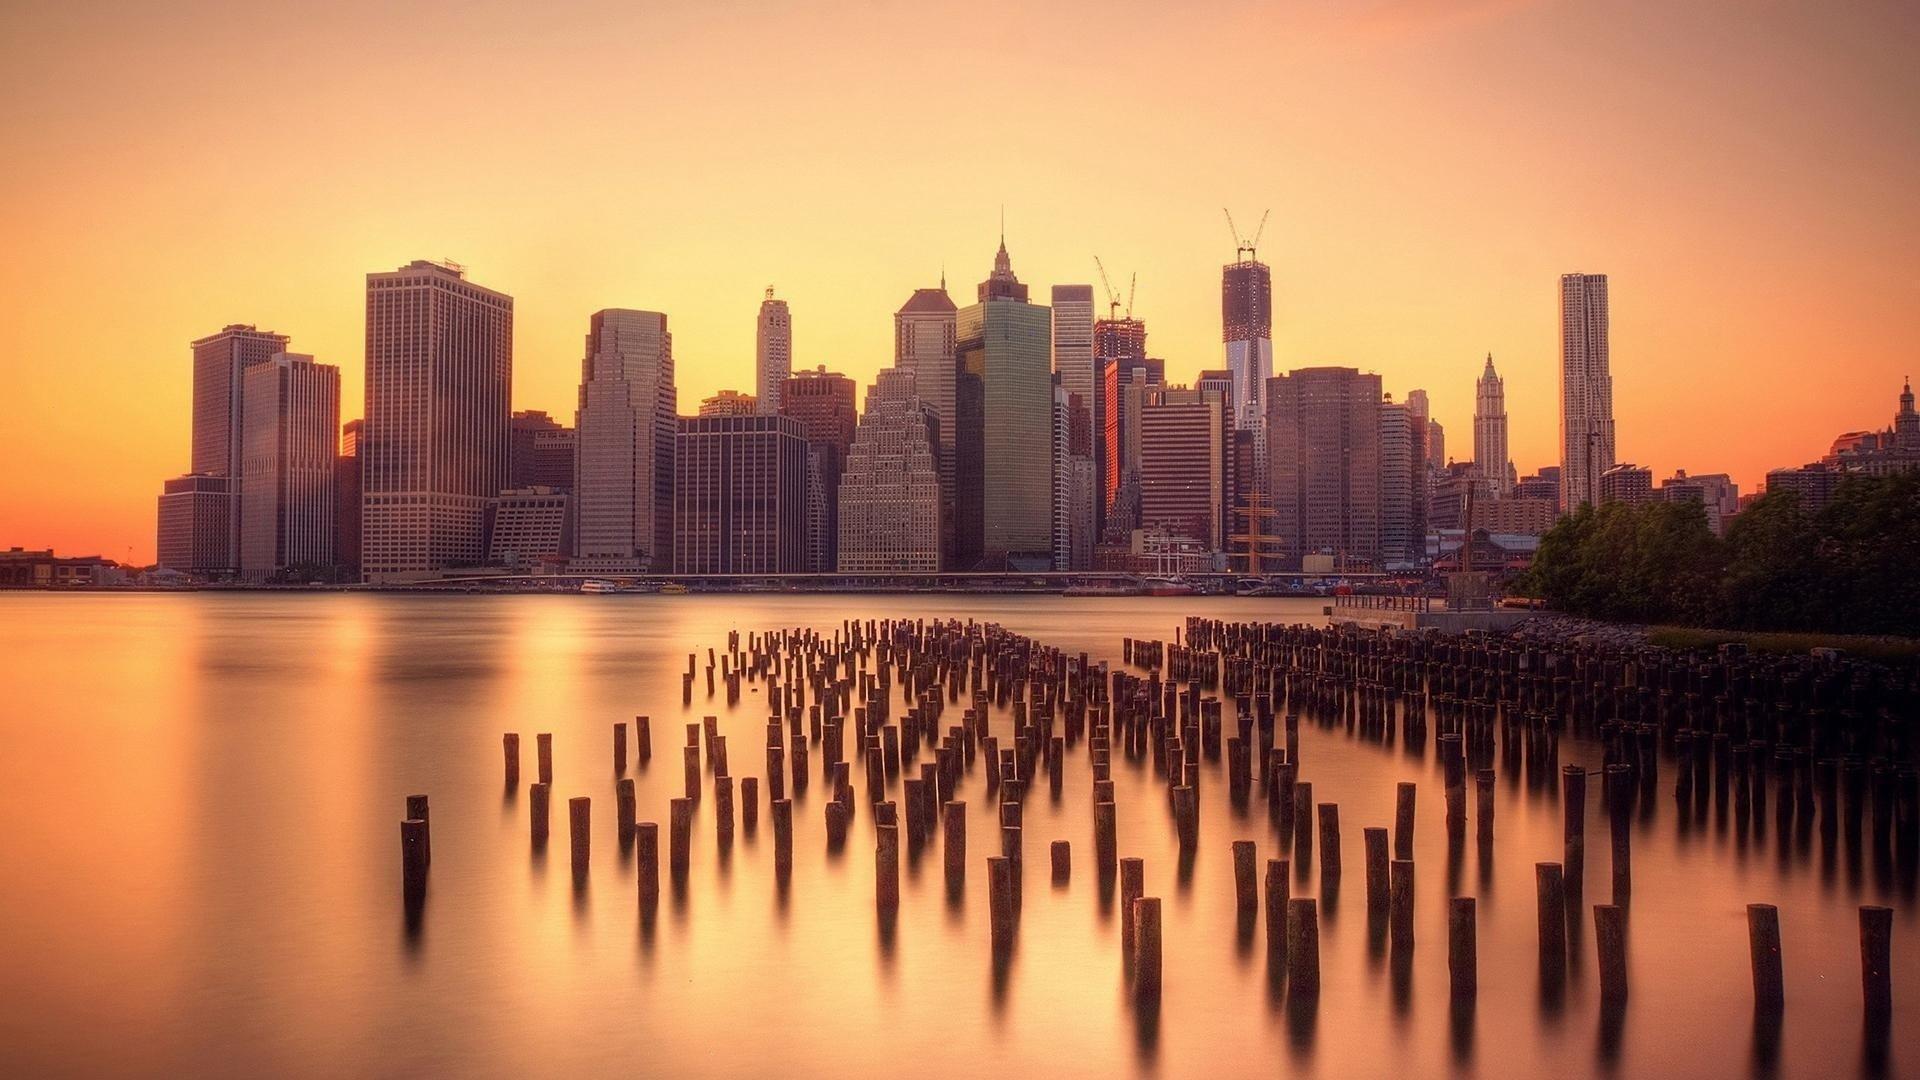 New york wallpapers 1920x1080 full hd 1080p desktop backgrounds - Wallpaper 1080p new york ...